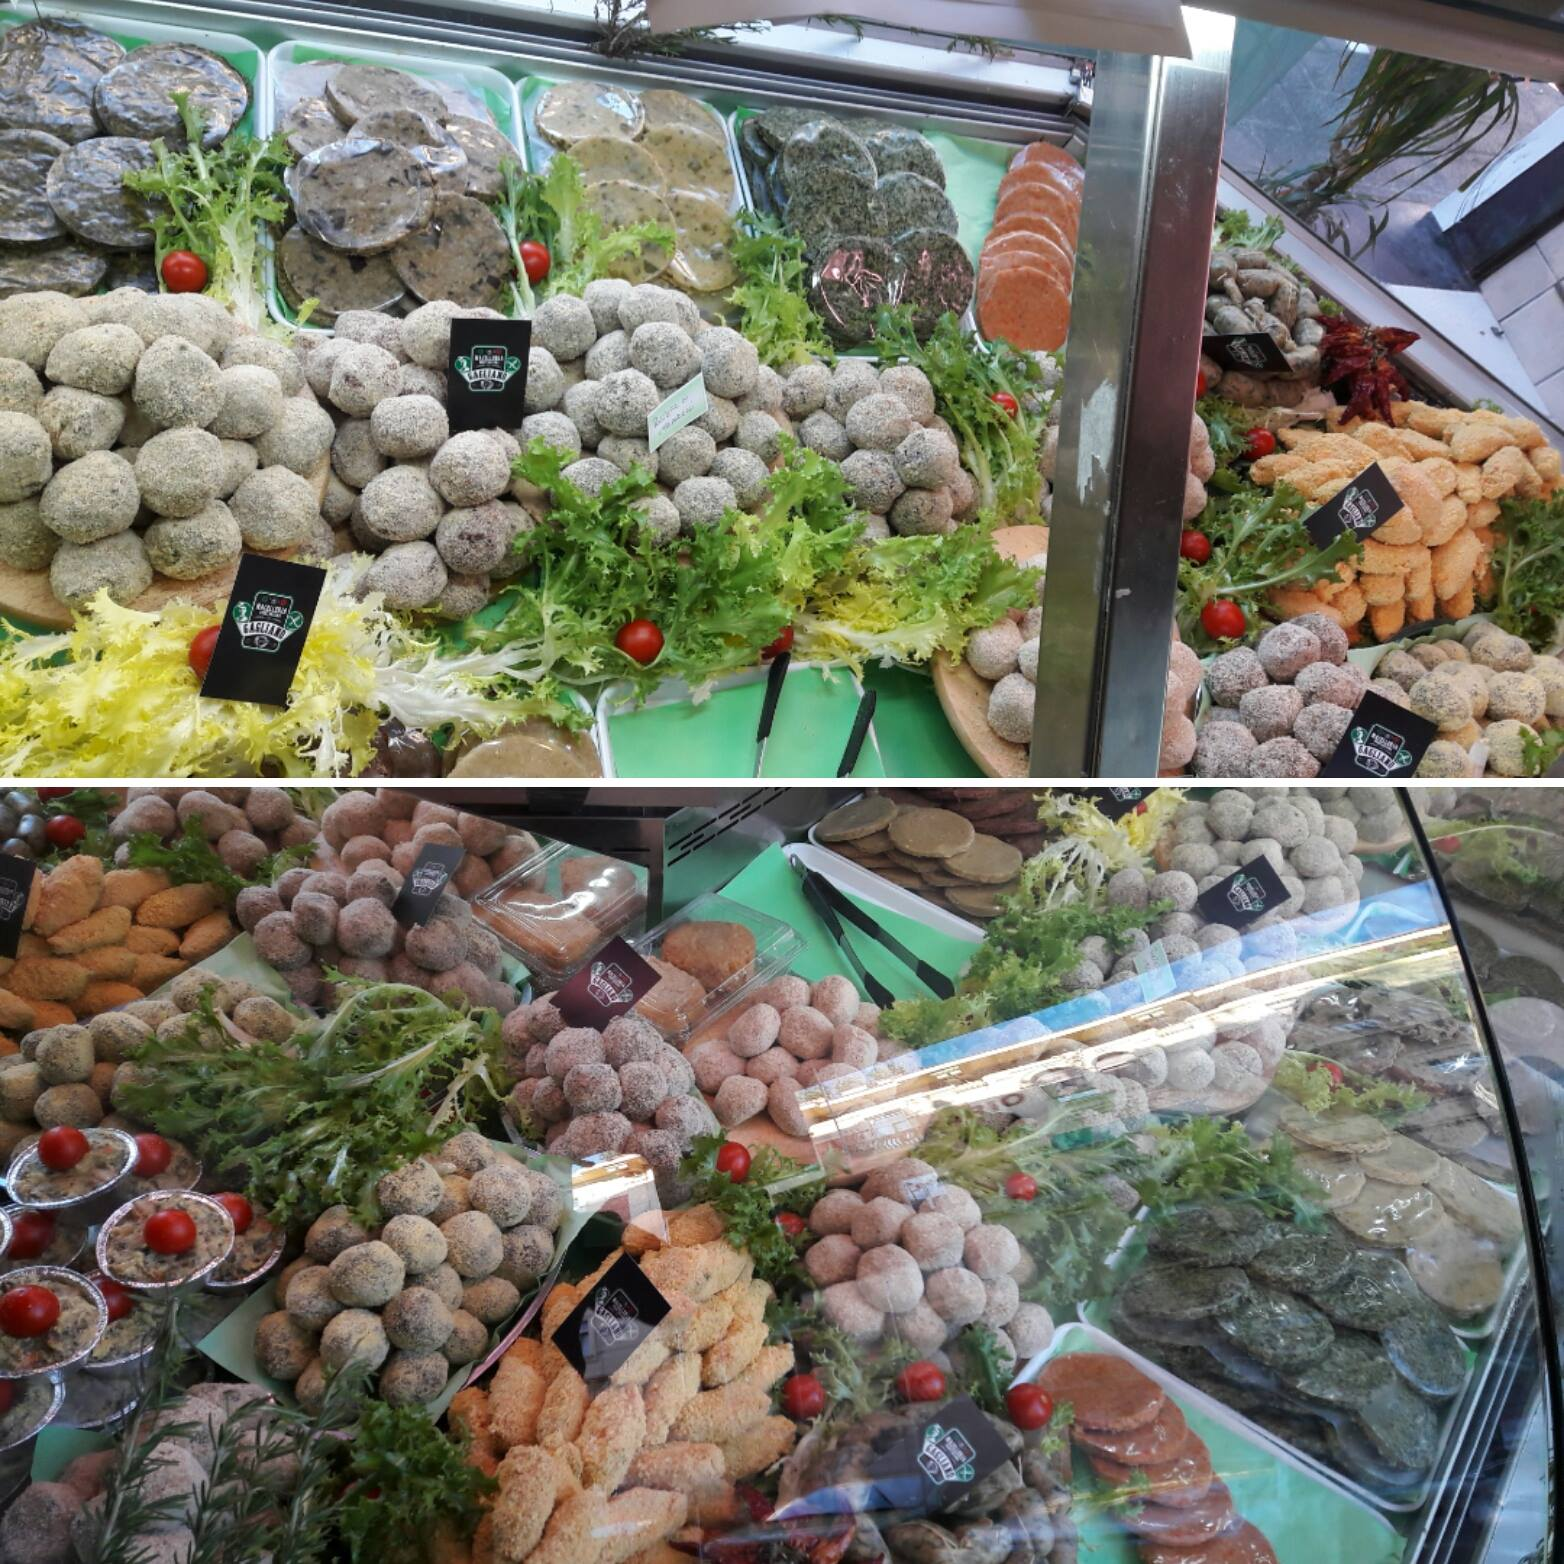 macelleria vegetariana Napoli